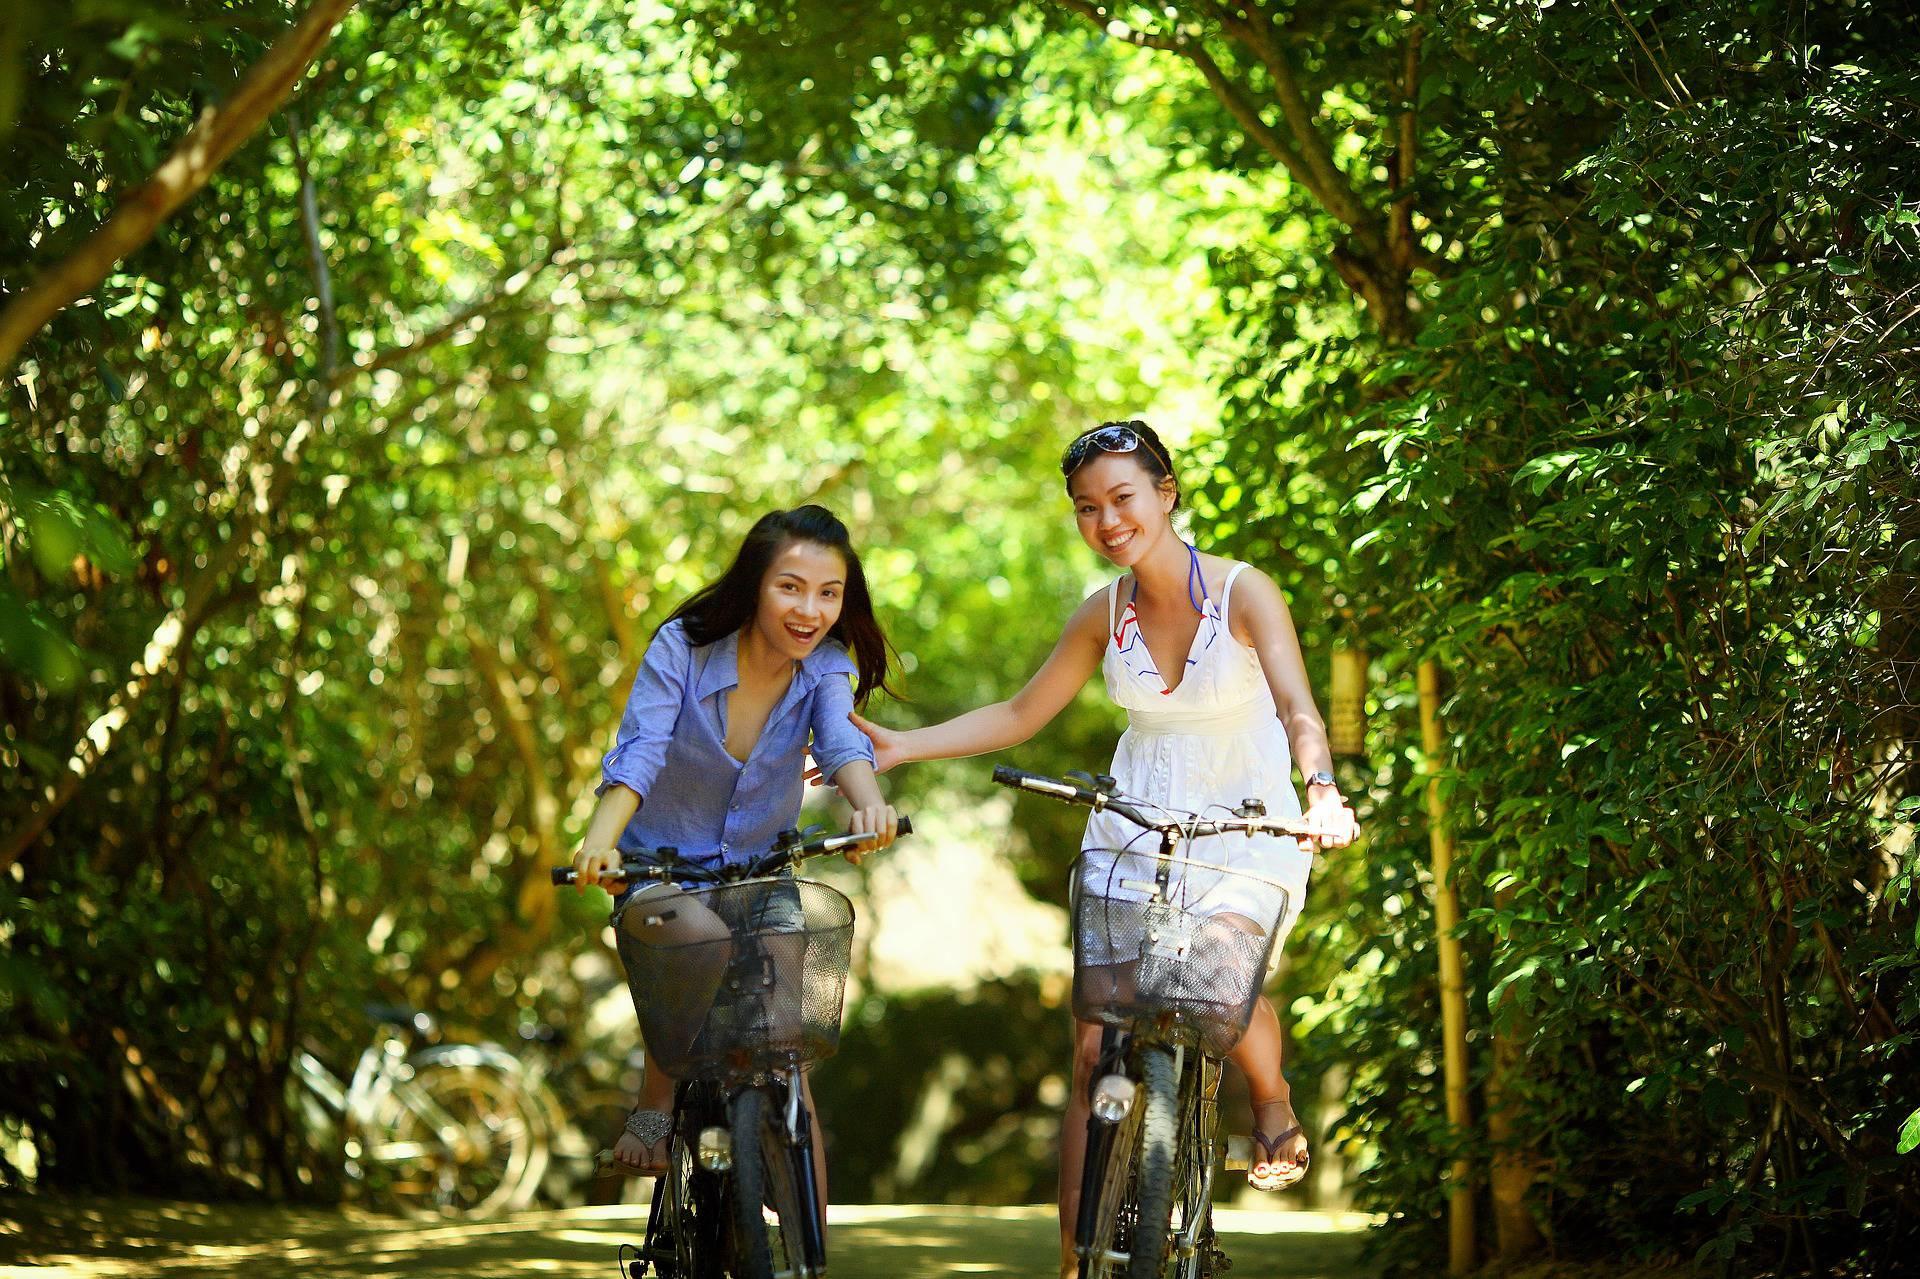 Amies riant à vélo